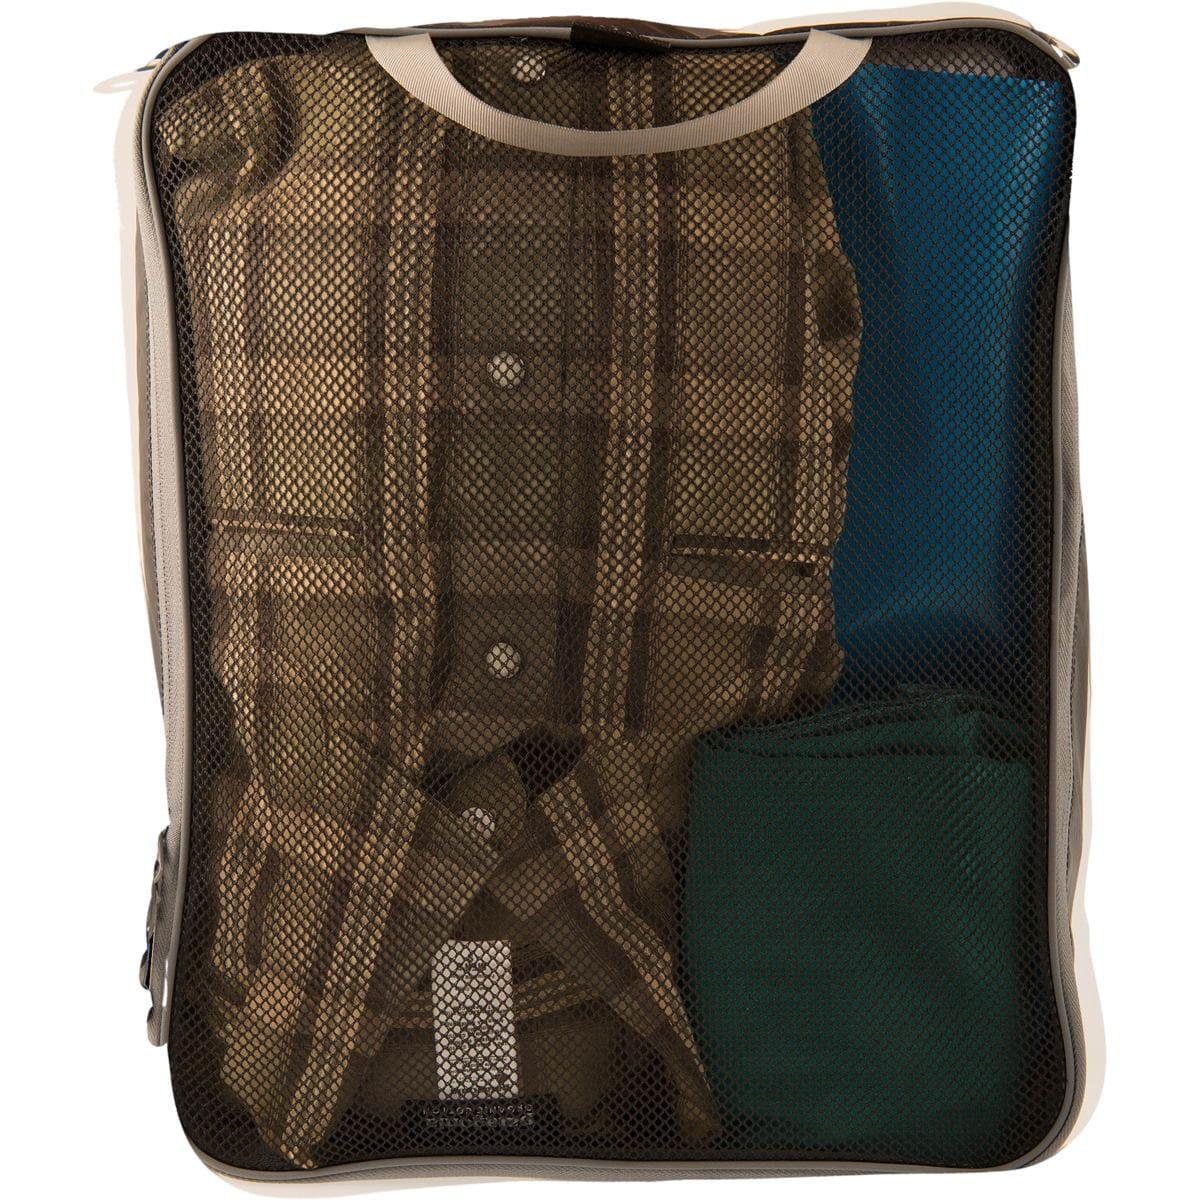 Sea to Summit TravellingLight™ Garment Mesh Bags Größe M - Bild 5